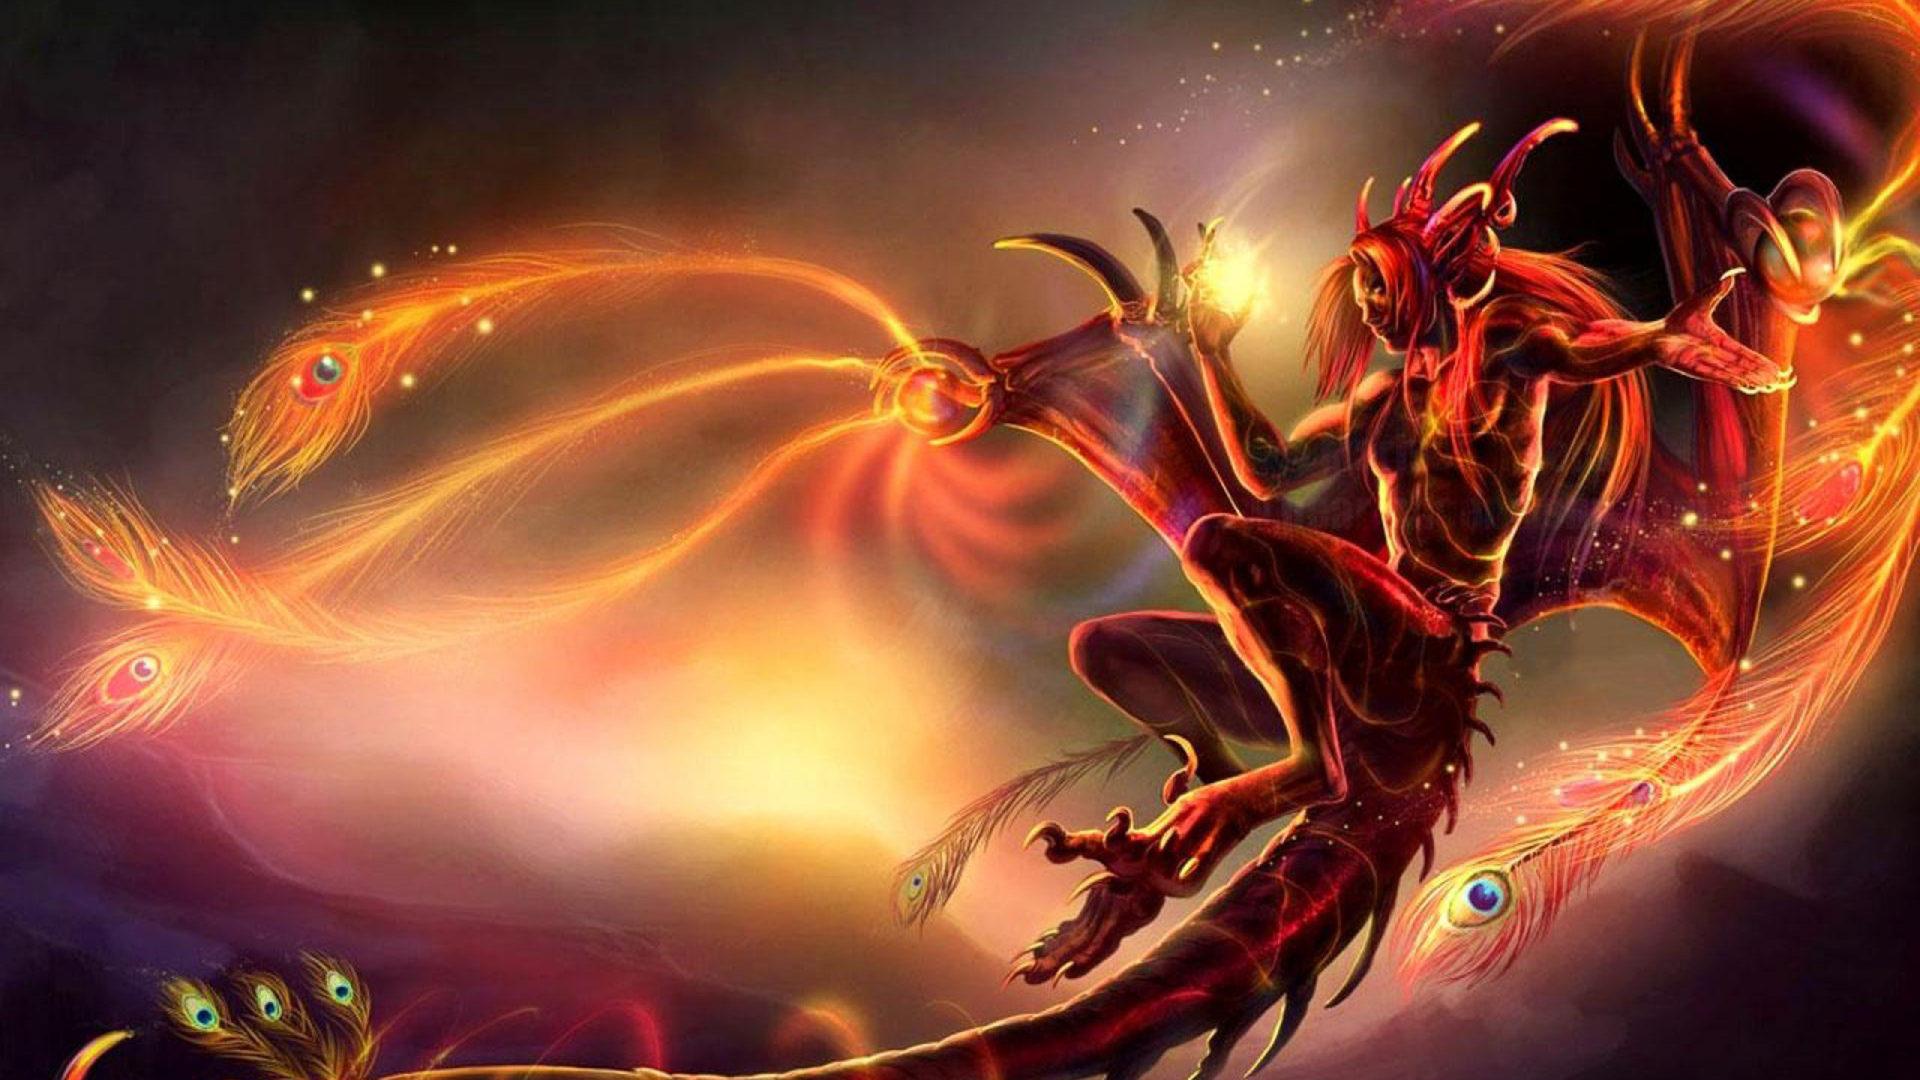 Beautiful Vampire Girl Wallpaper Red Creature Dark Cgi Devil Hell Fantasy Angel Wings